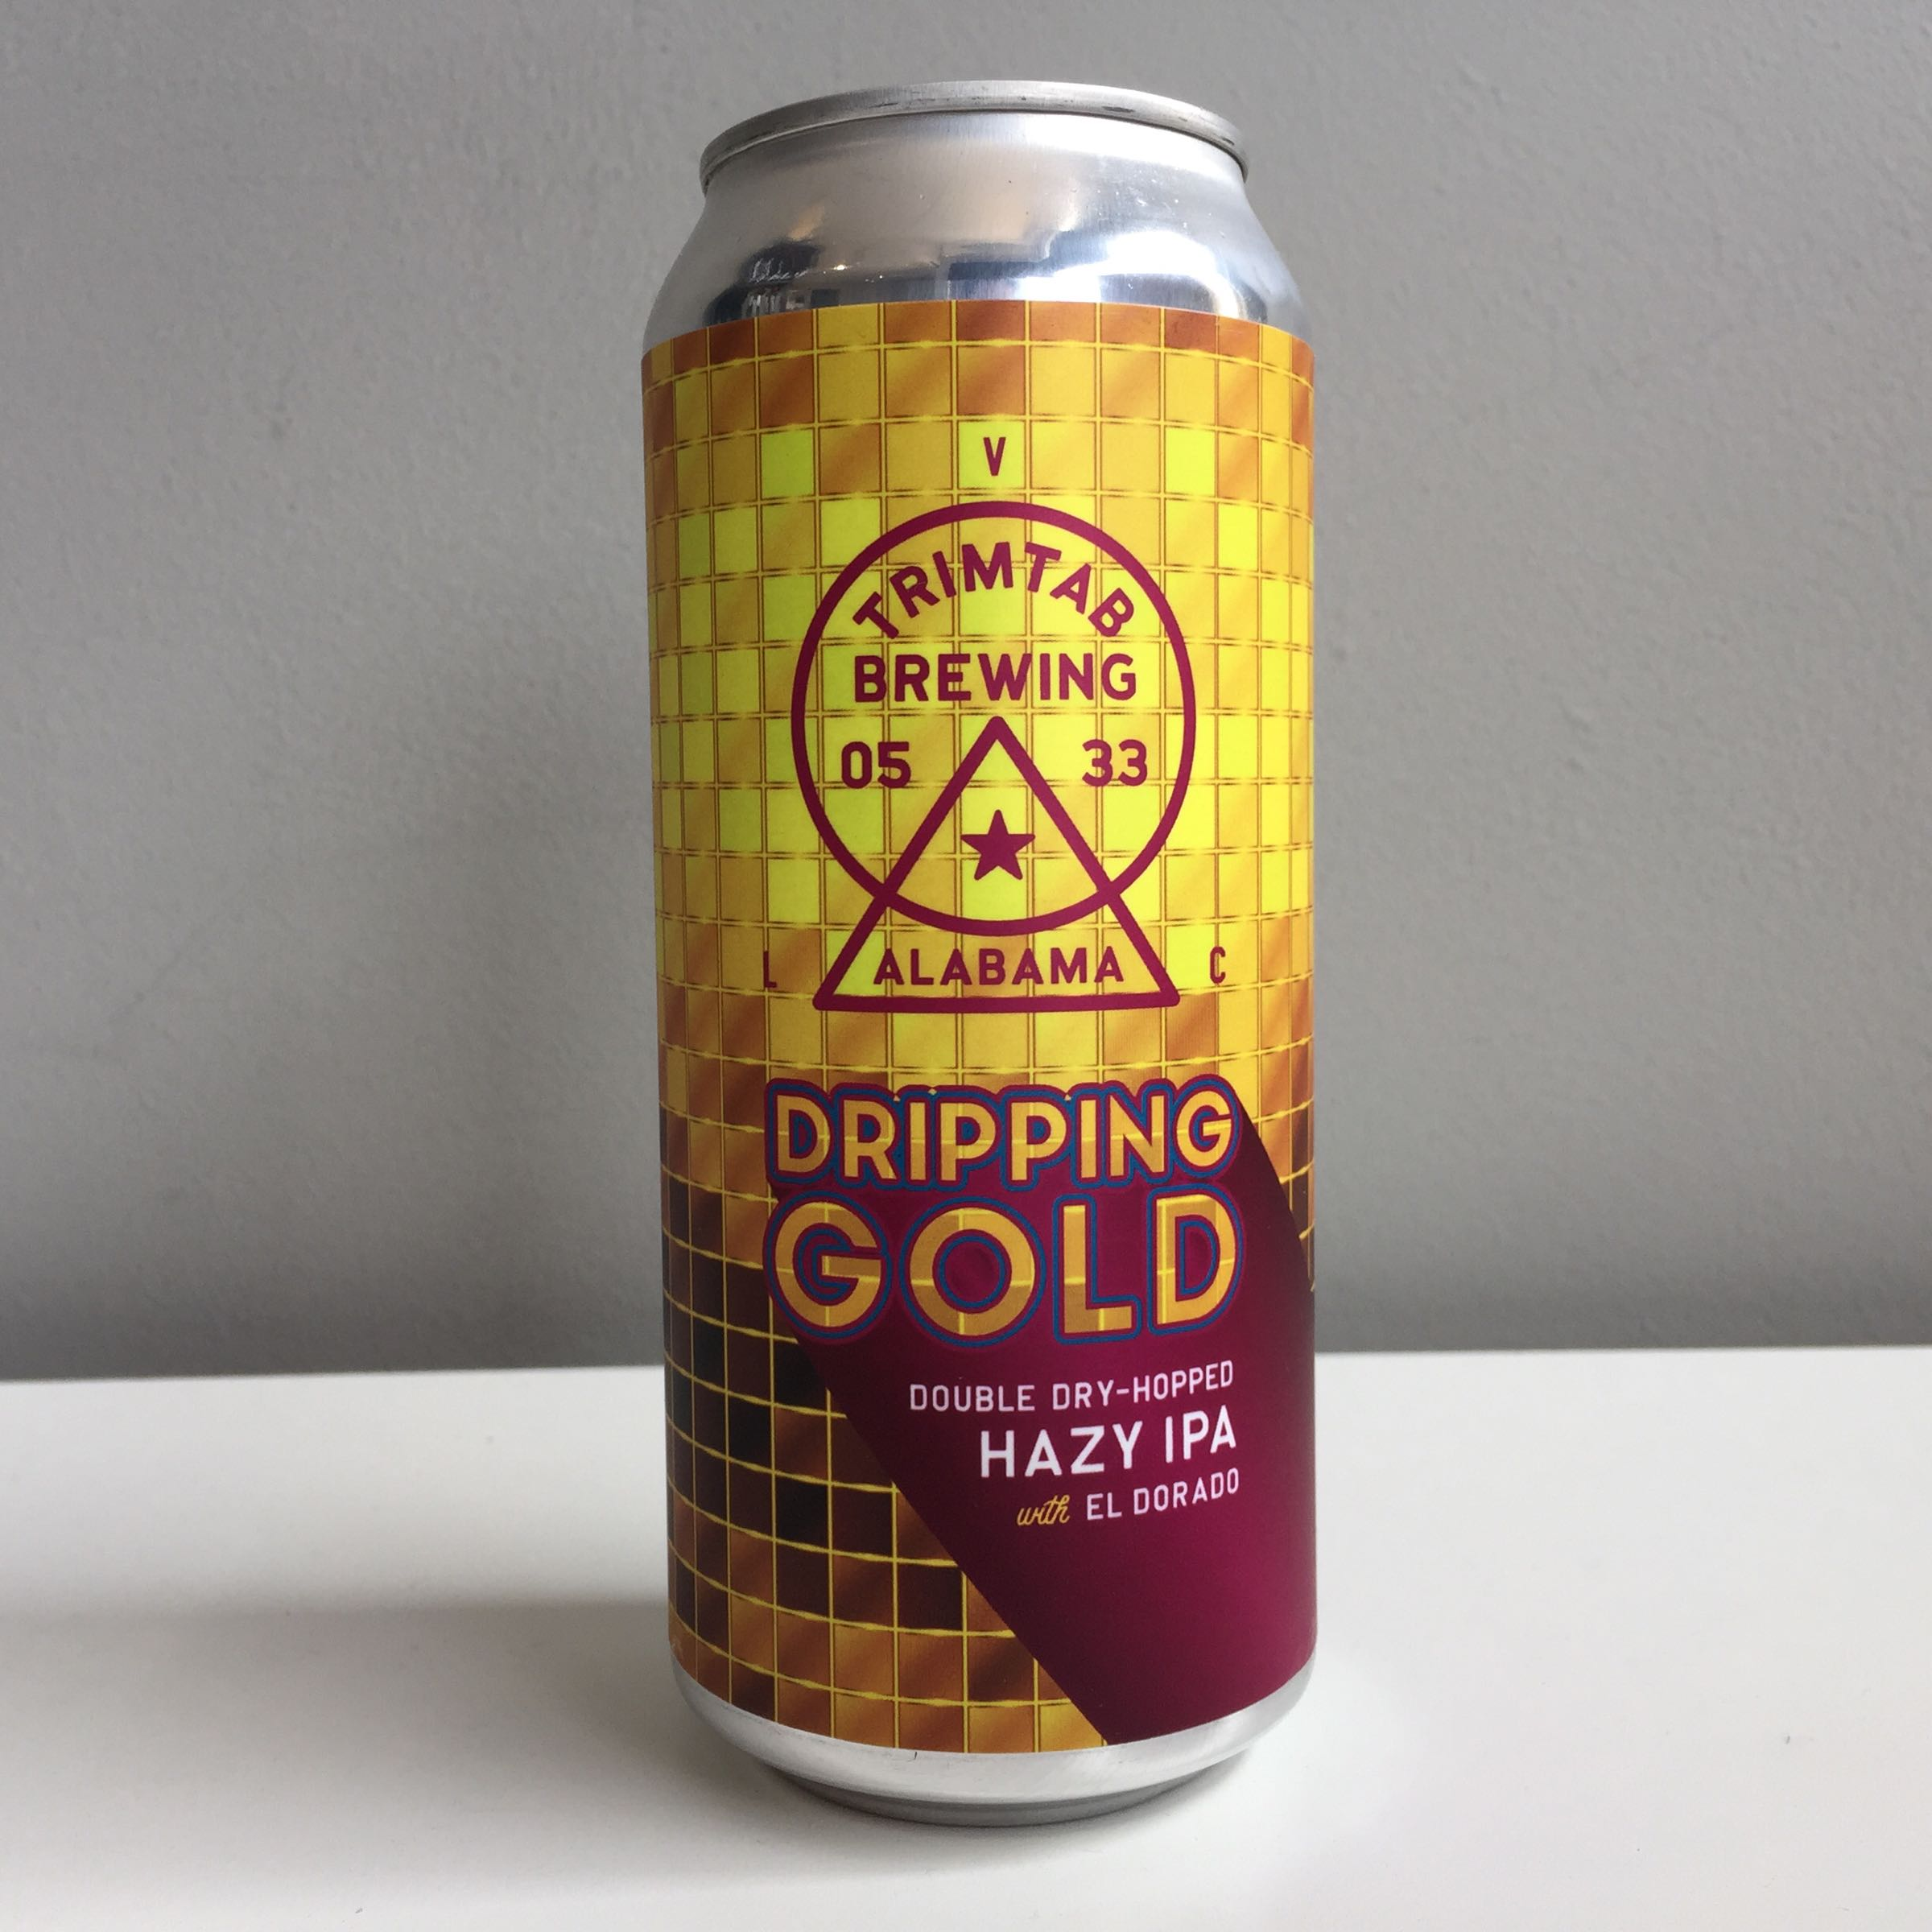 Trimtab Brewing 'Dripping Gold' Hazy IPA 440ml 7% ABV